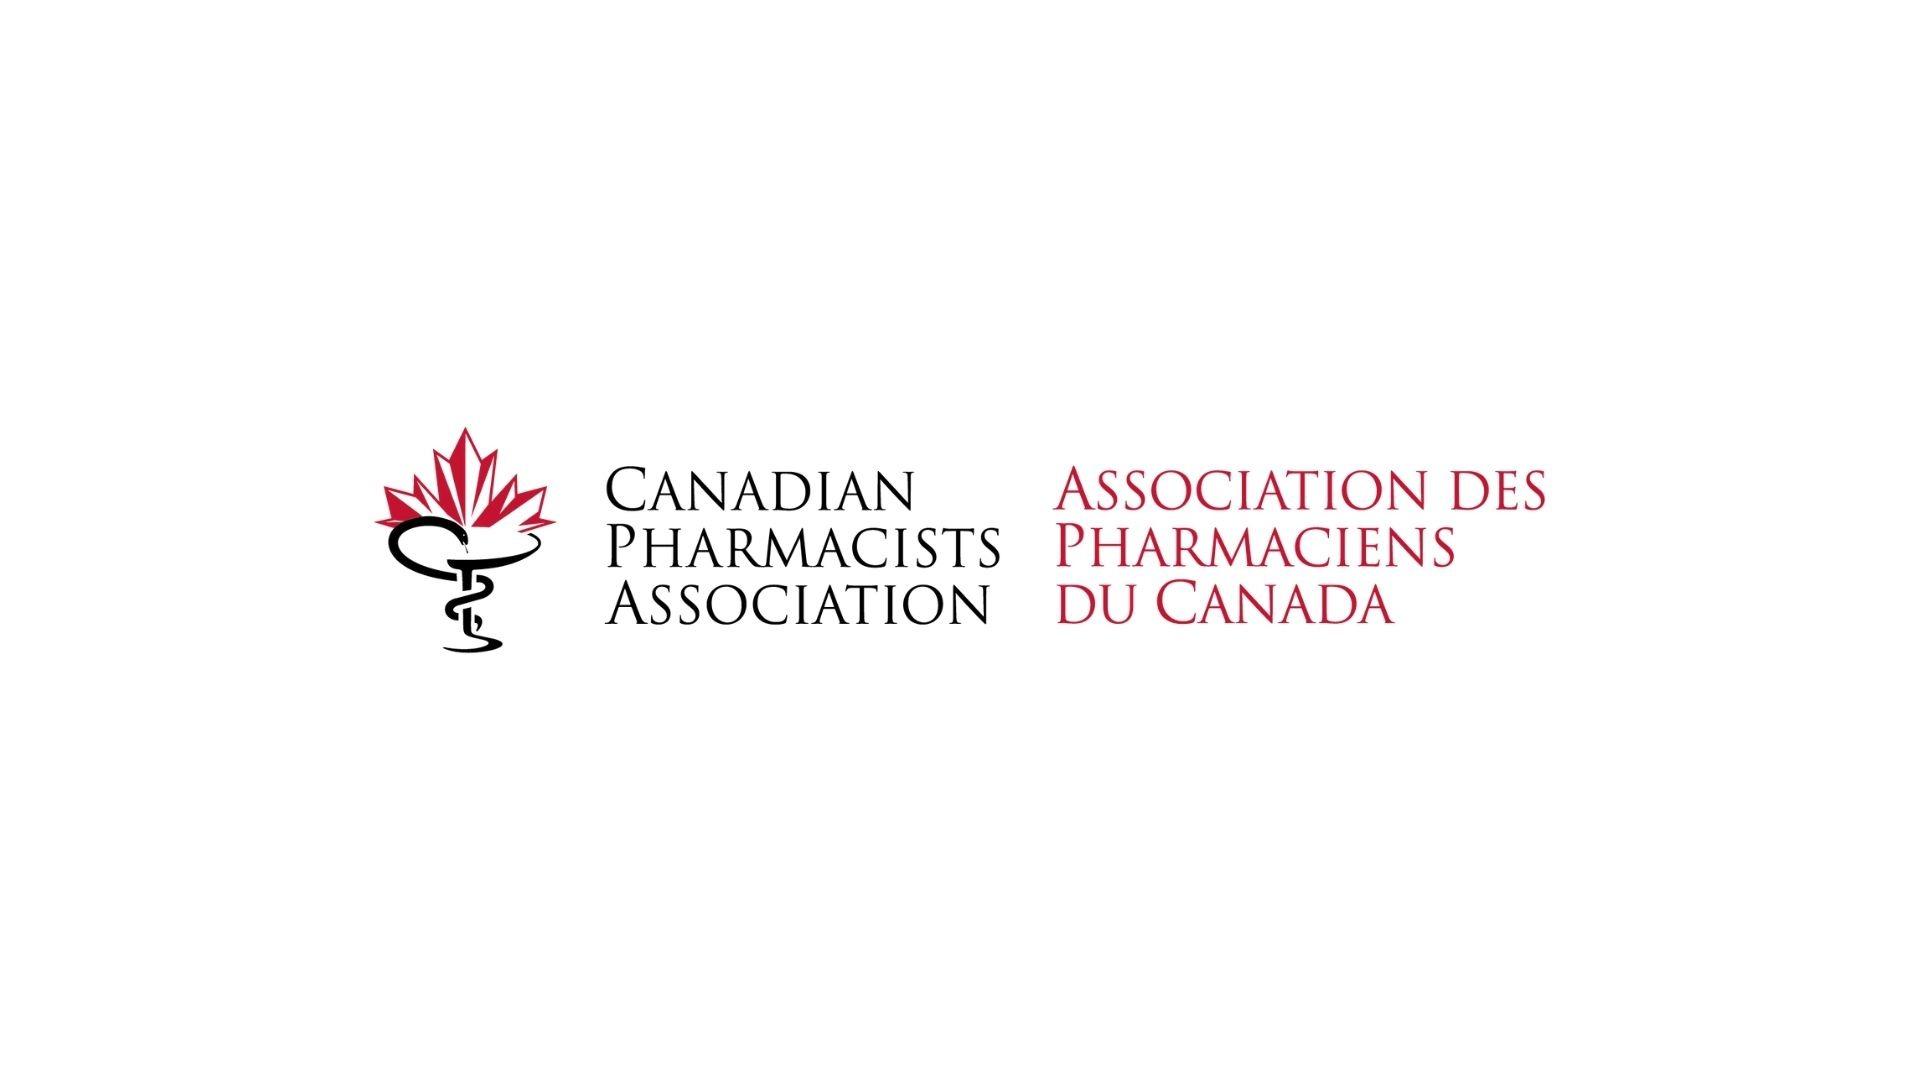 Canadian Pharmacists Association Benefits